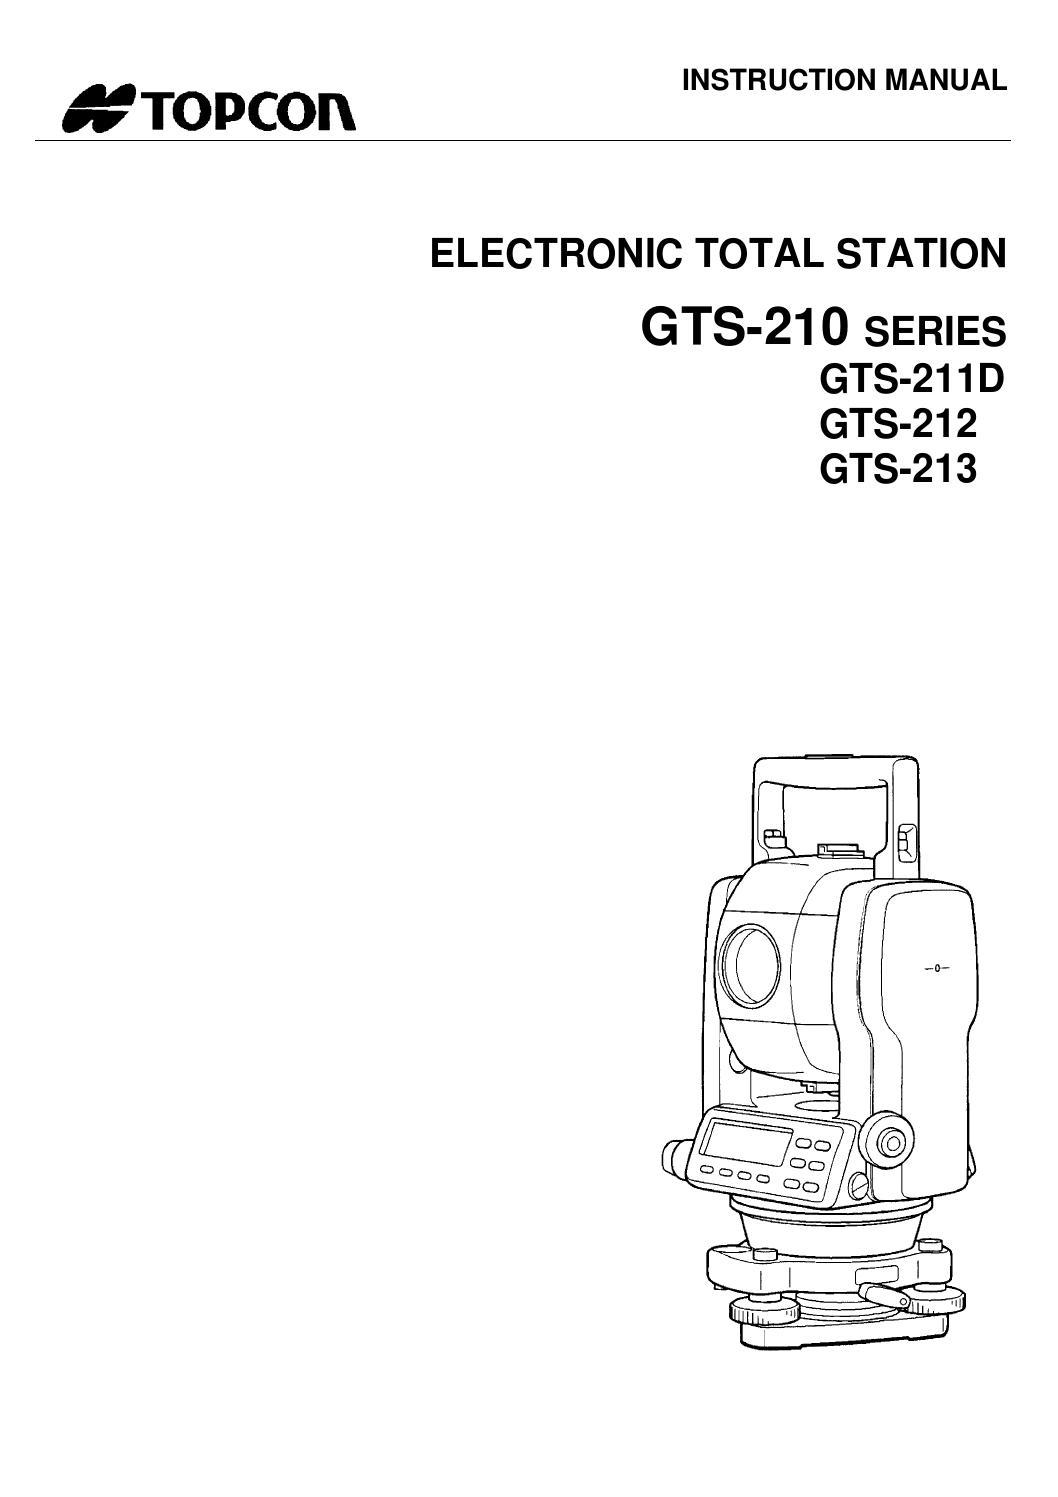 Topcon gts 210 english manual by Land Surveyors United